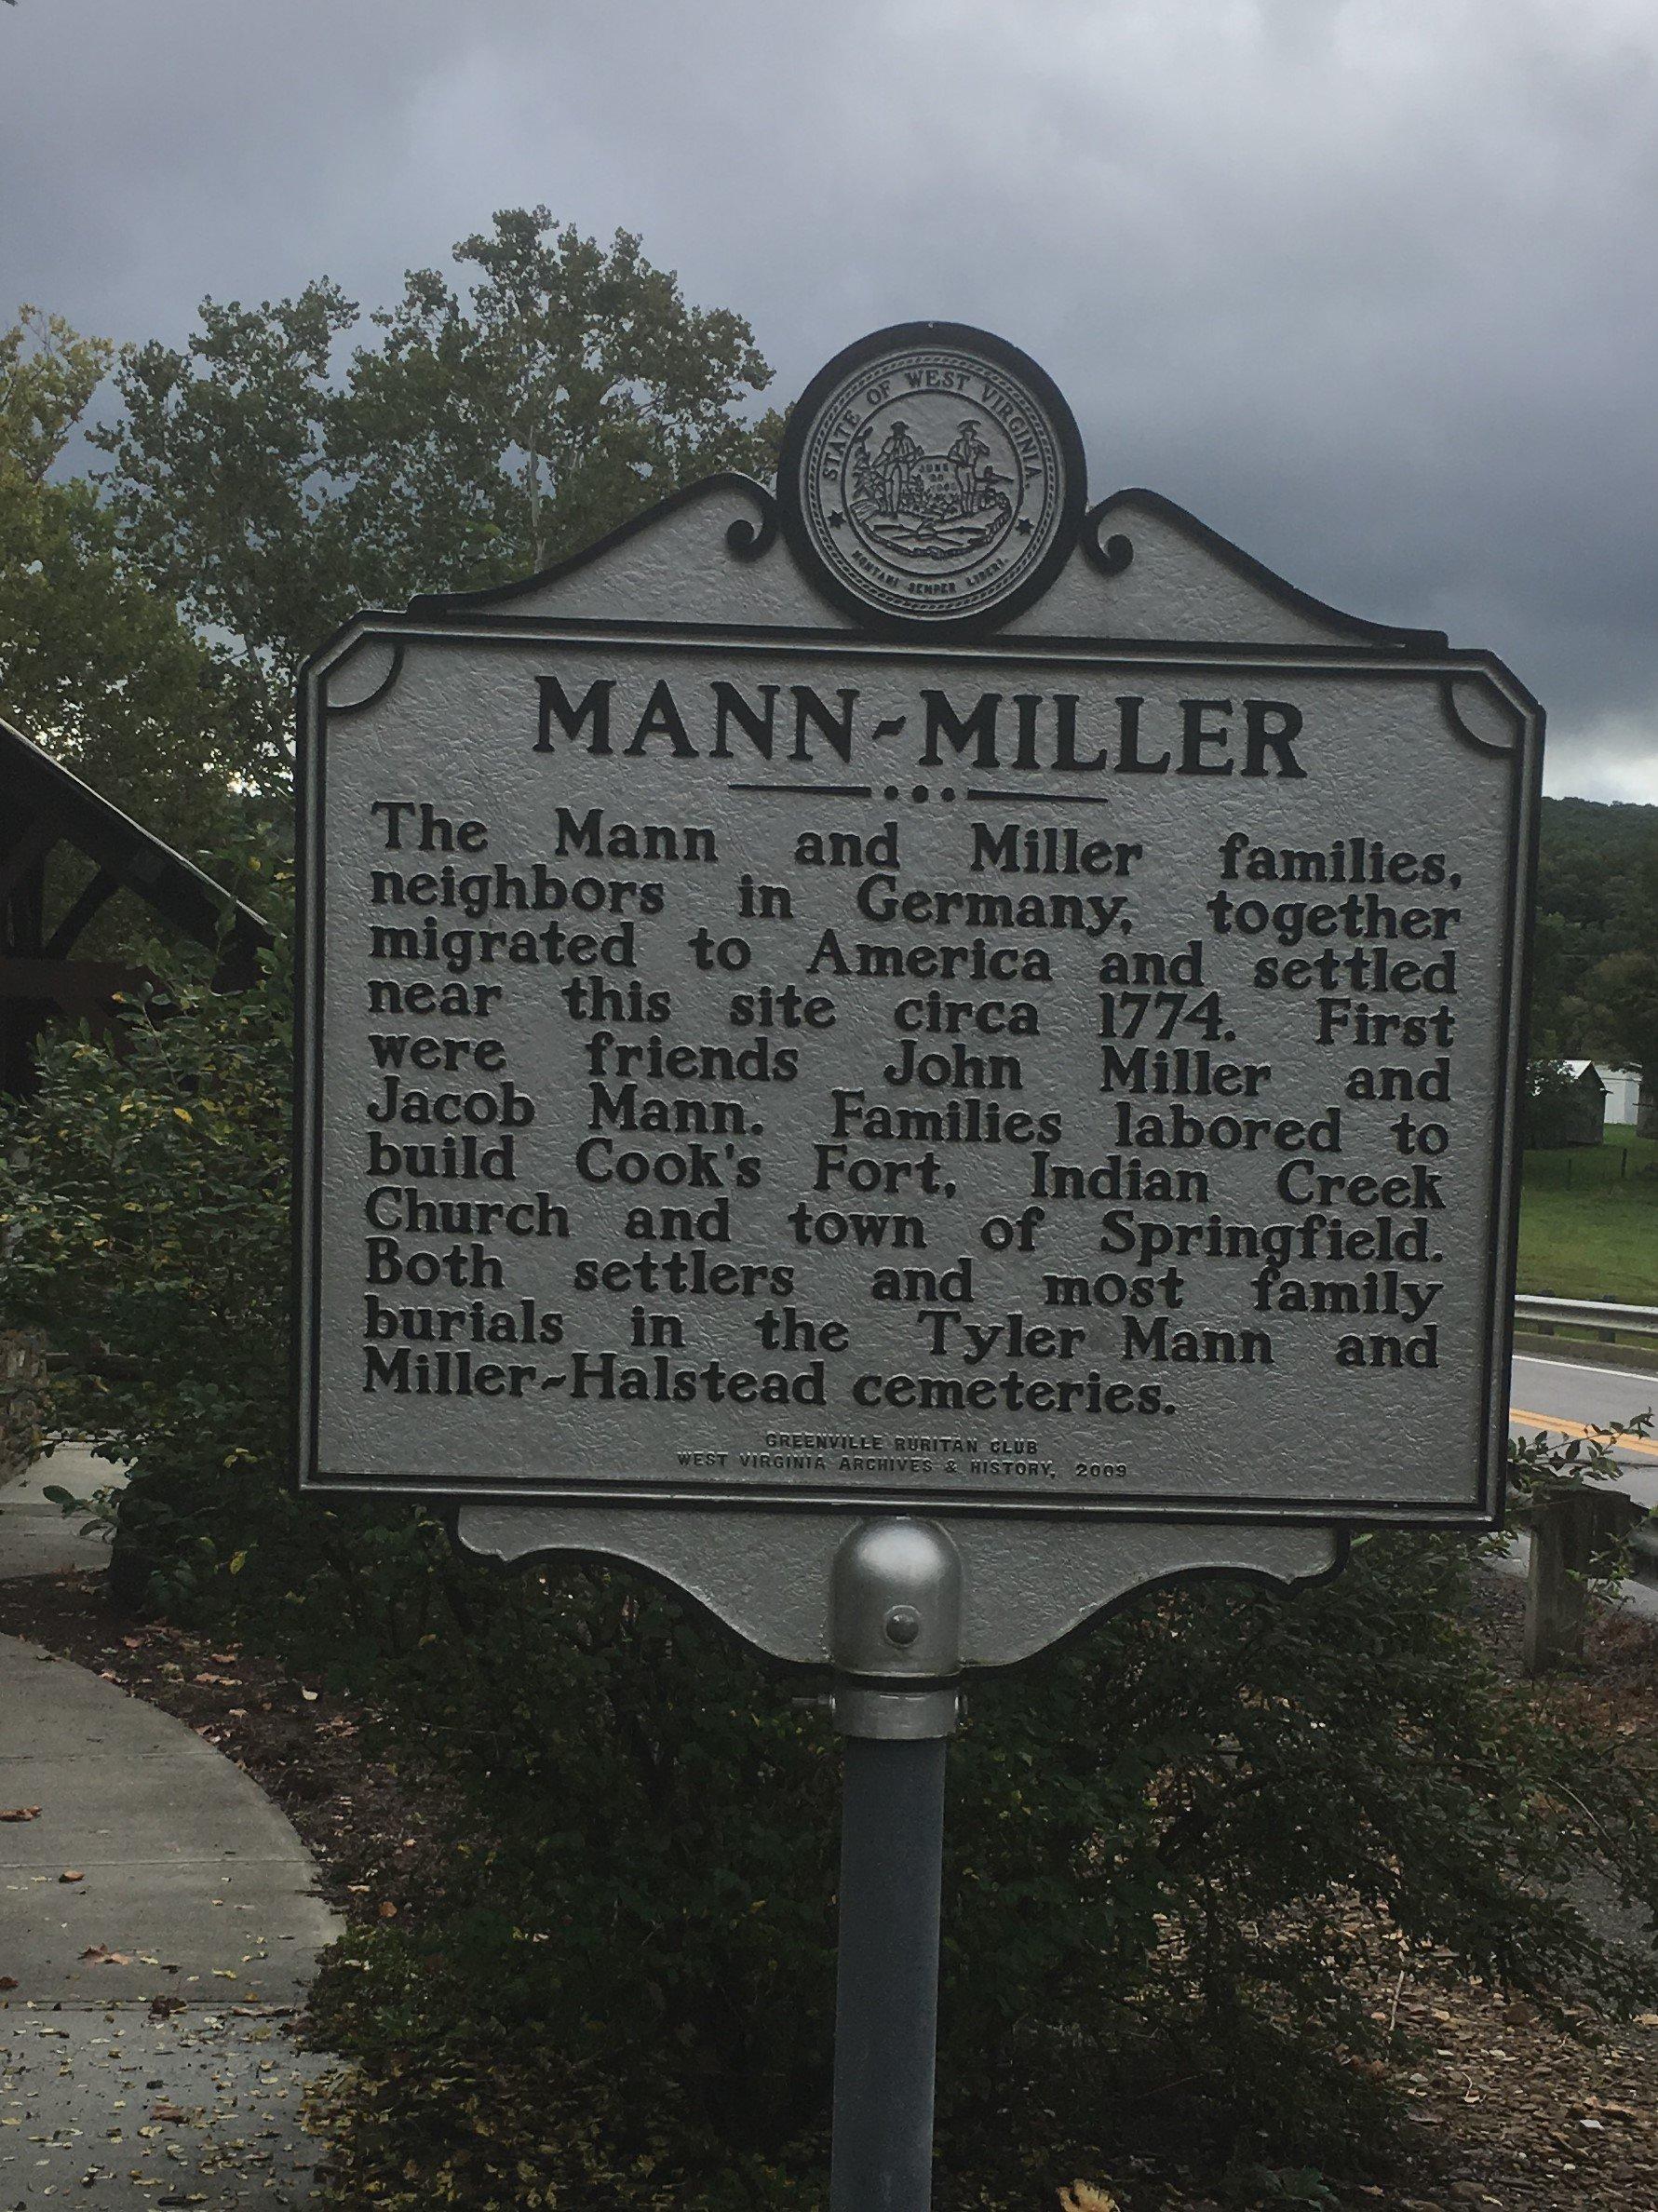 Mann-Miller Historical marker at the Hunter Springs pavilion.